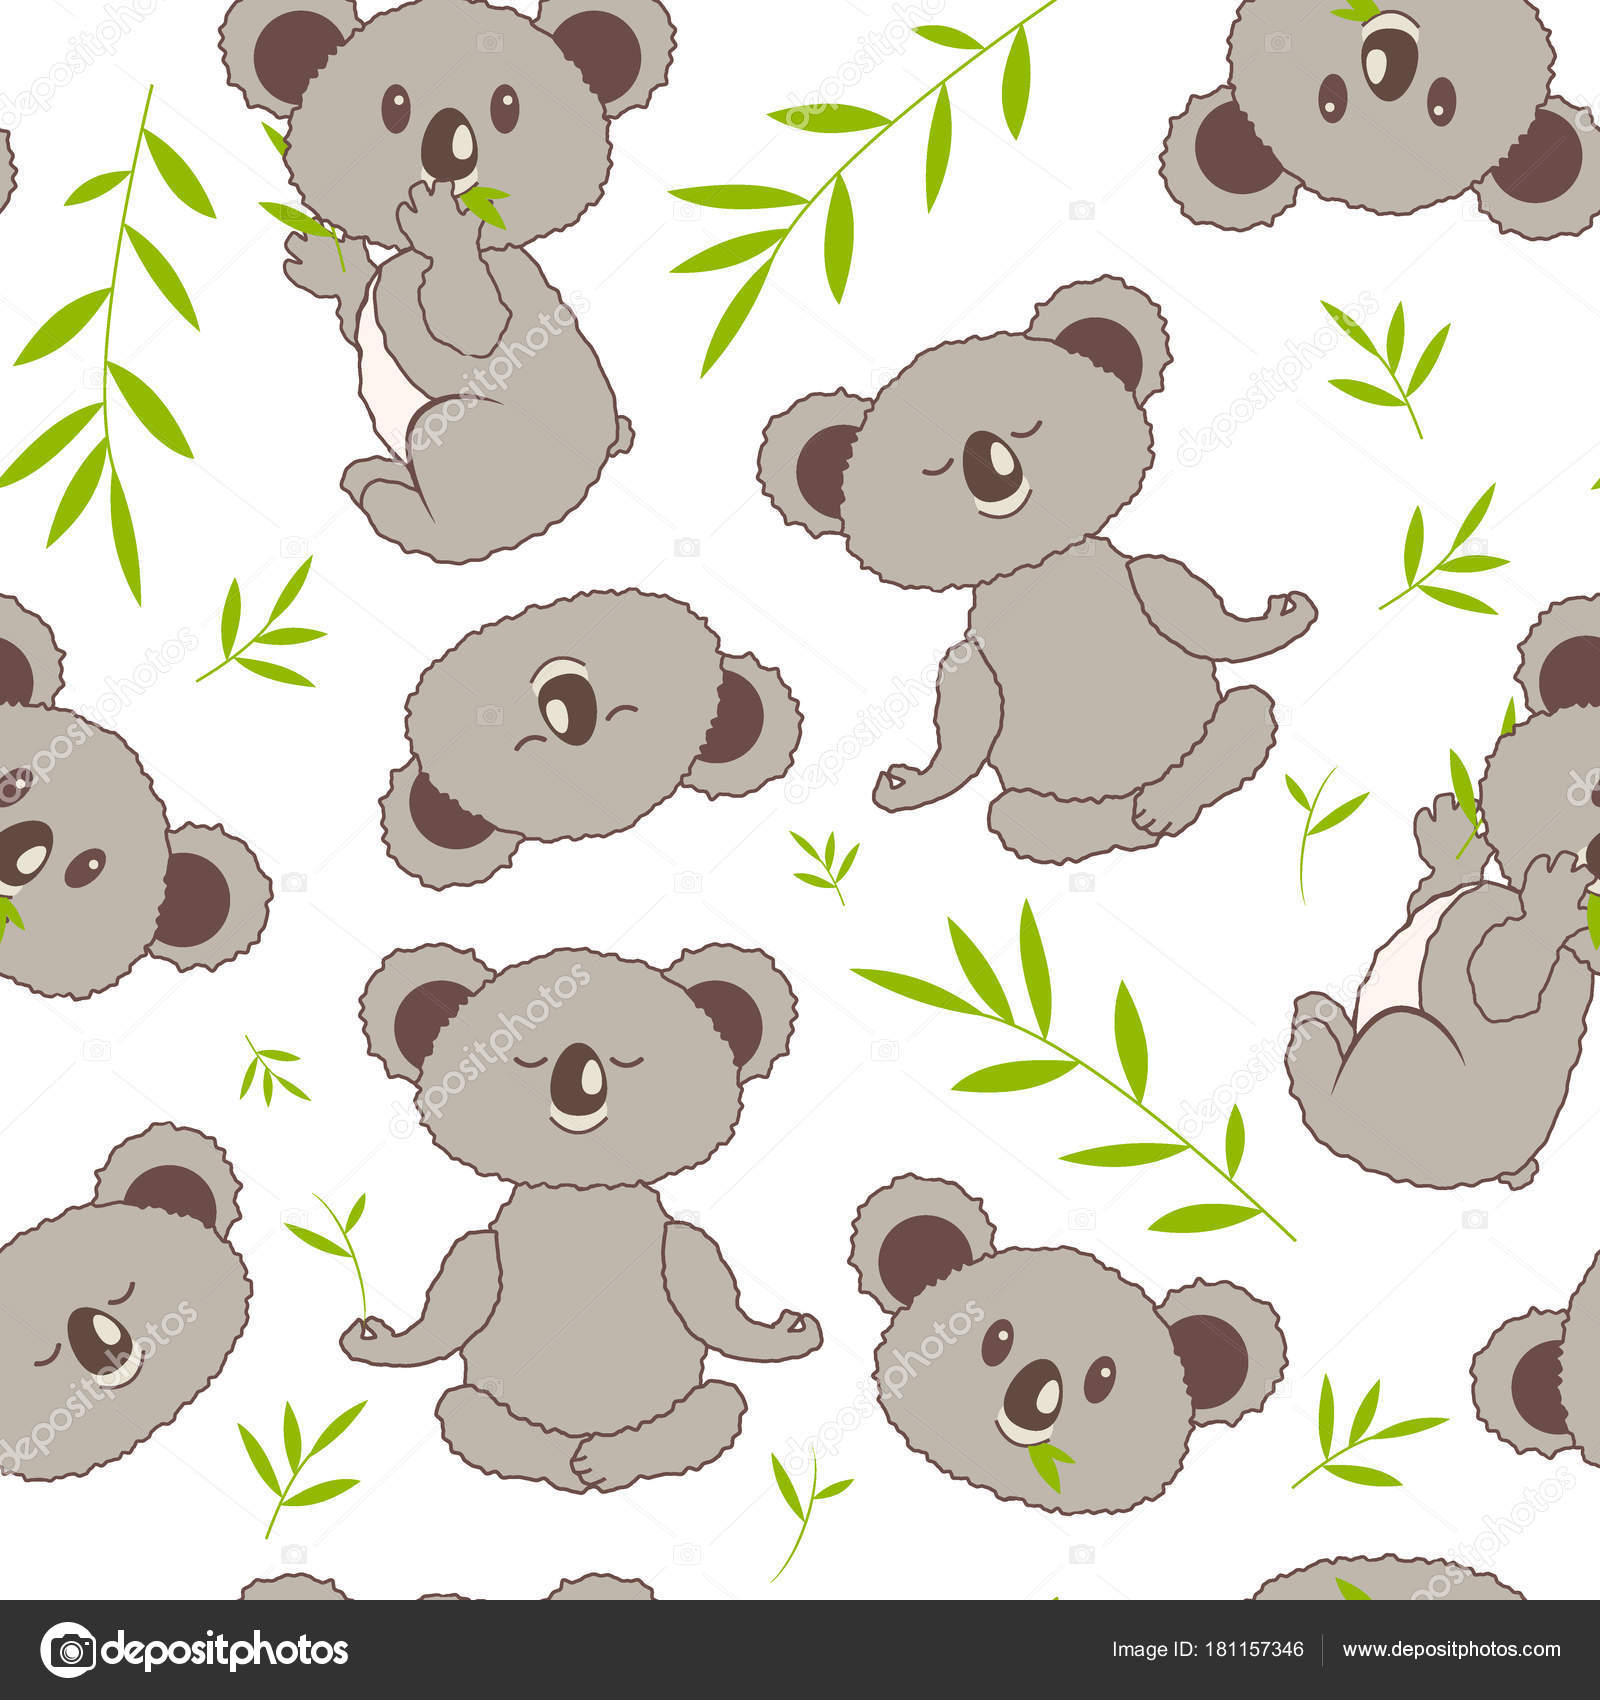 Lindo de patrones sin fisuras con koalas y eucalipto — Archivo ...